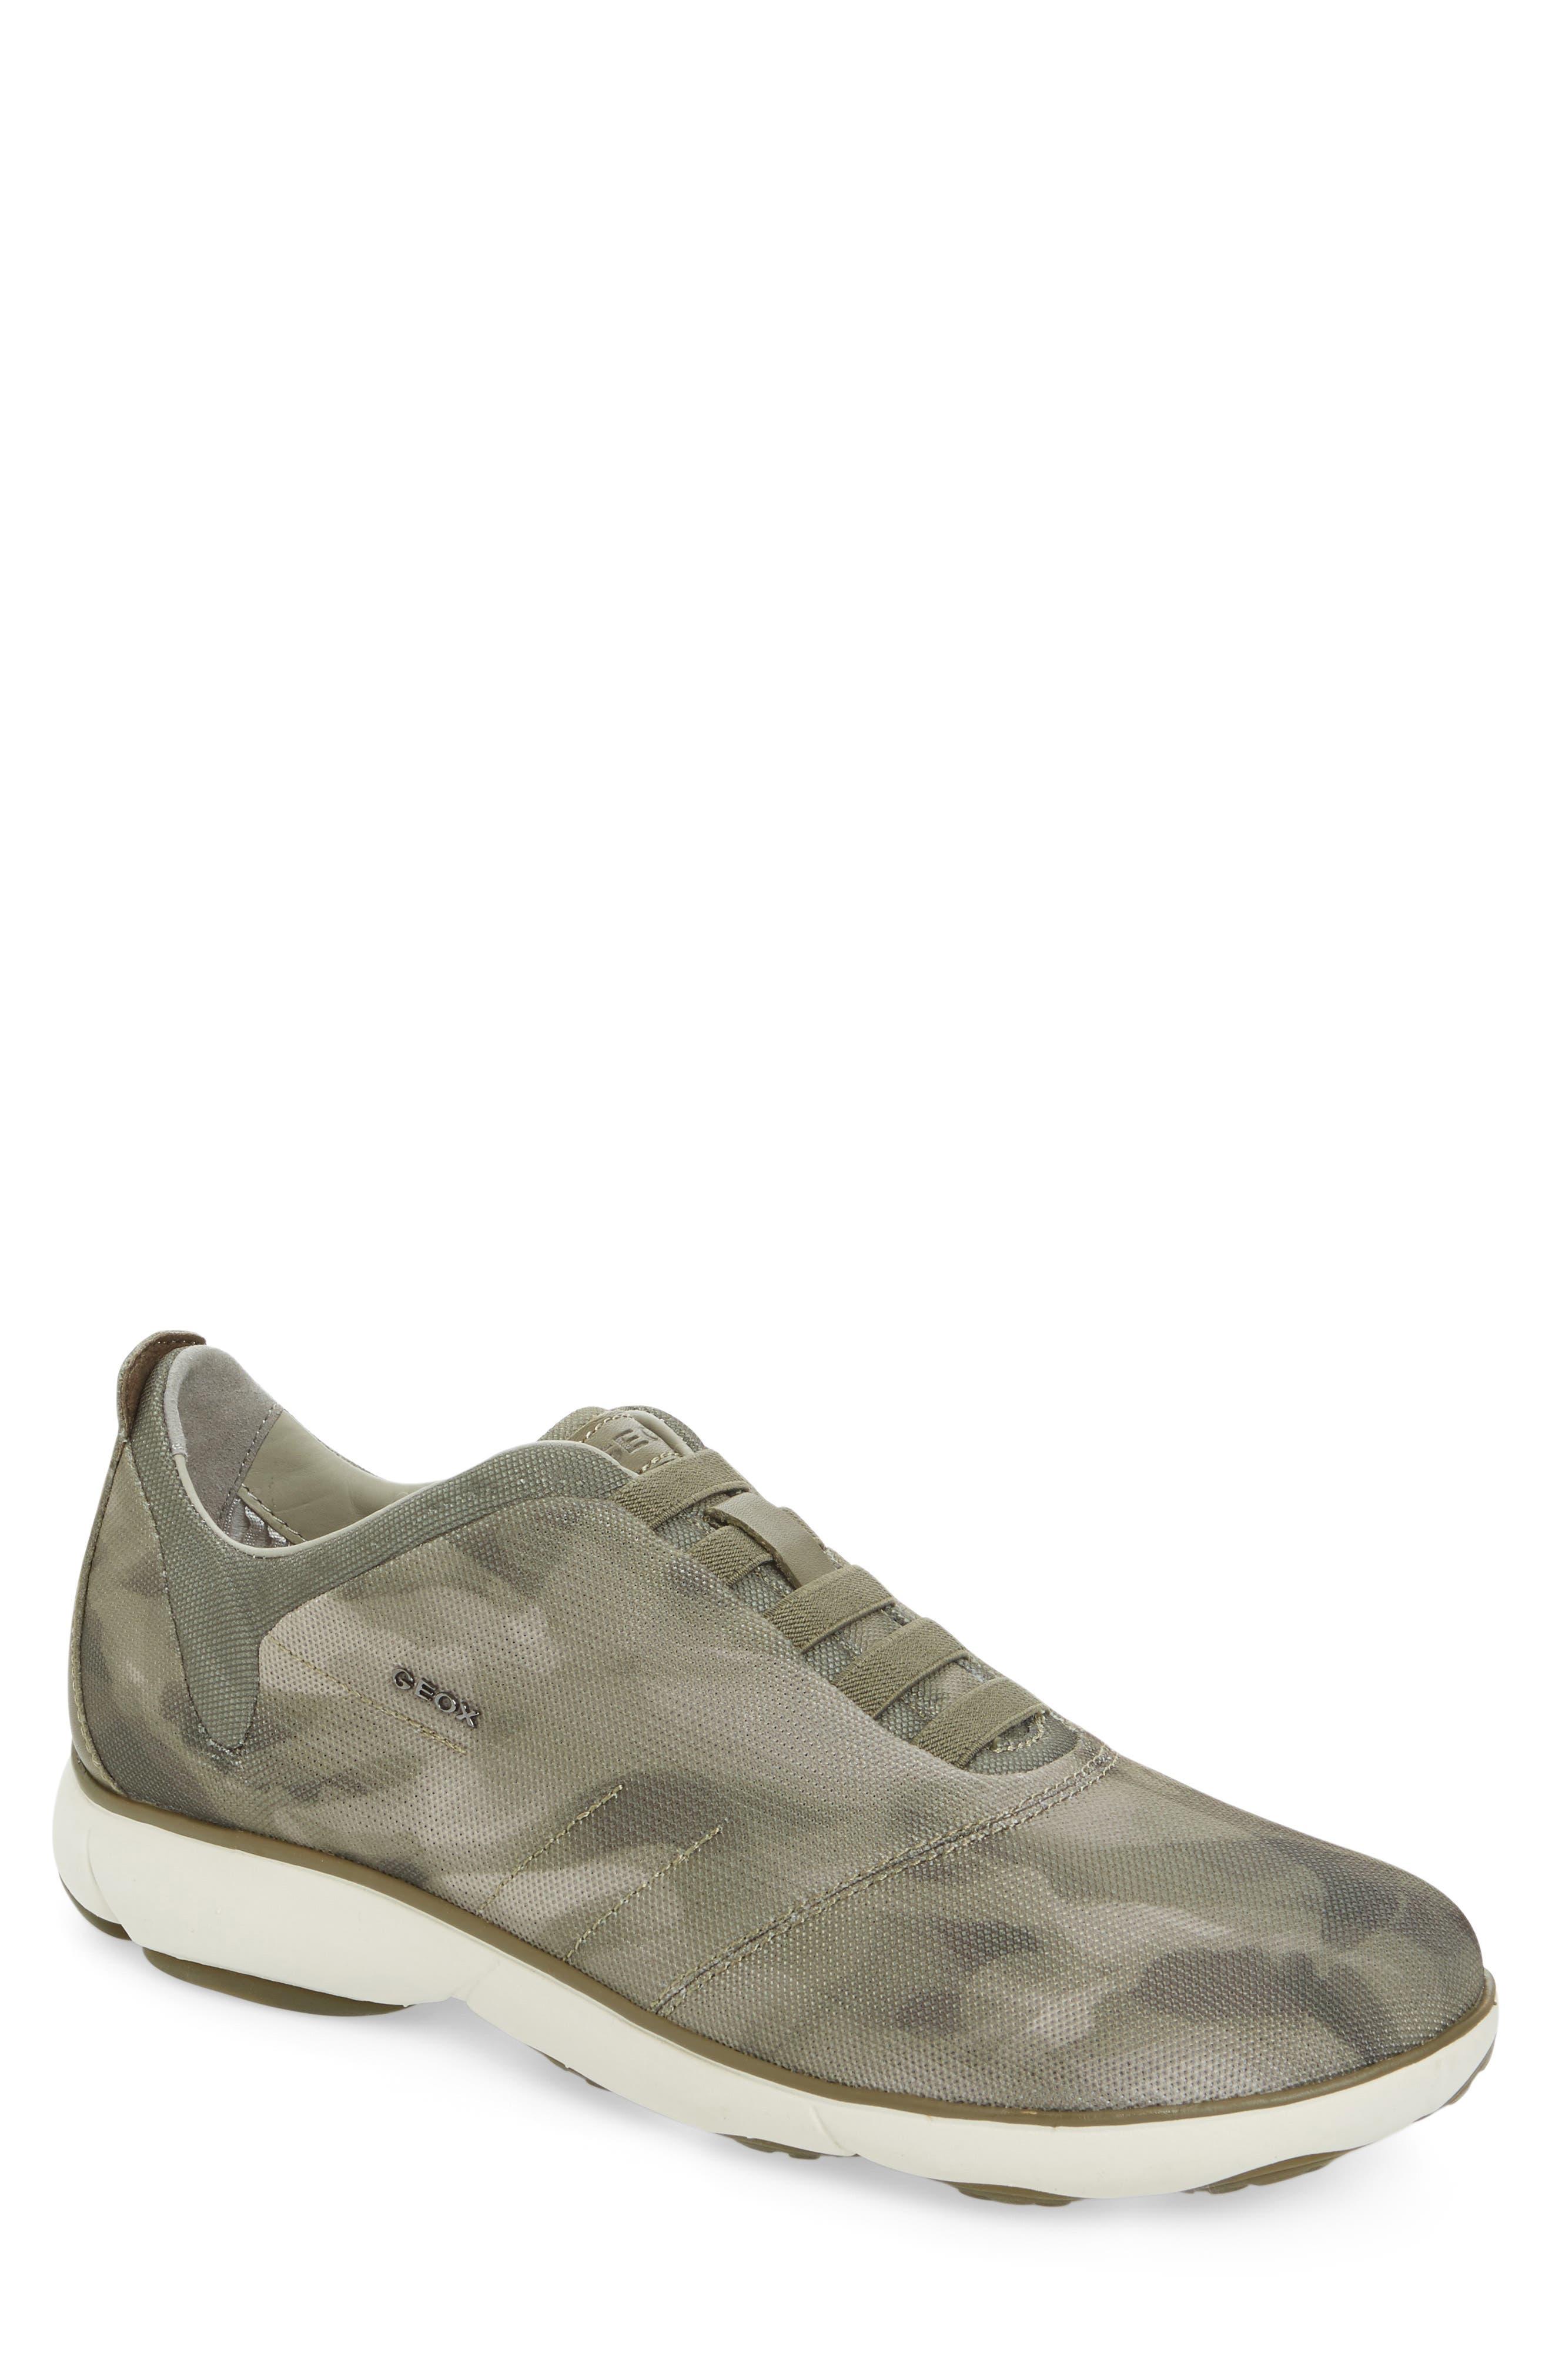 GEOX Nebula 26 Sneaker